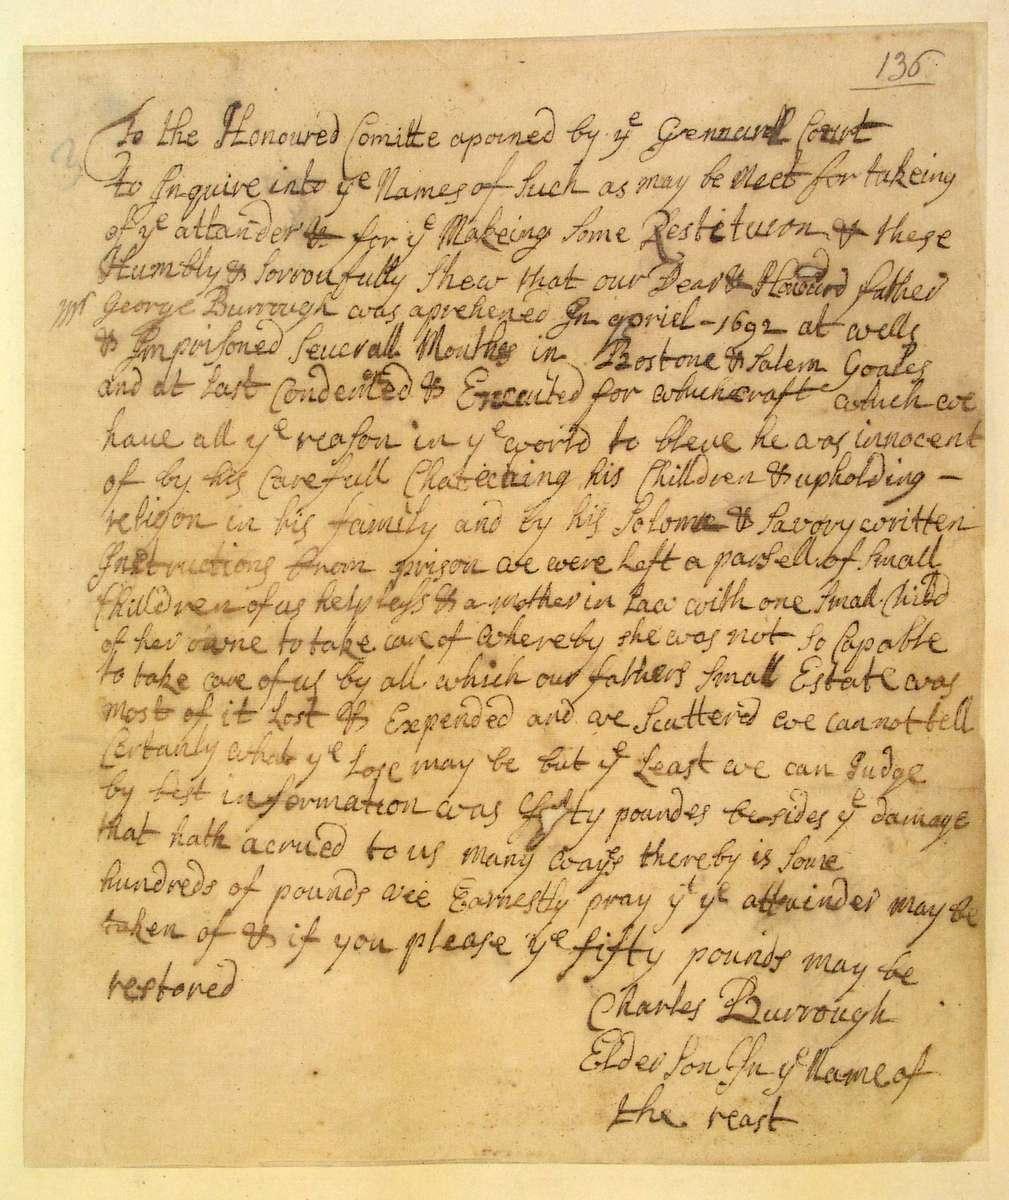 George burroughs essay